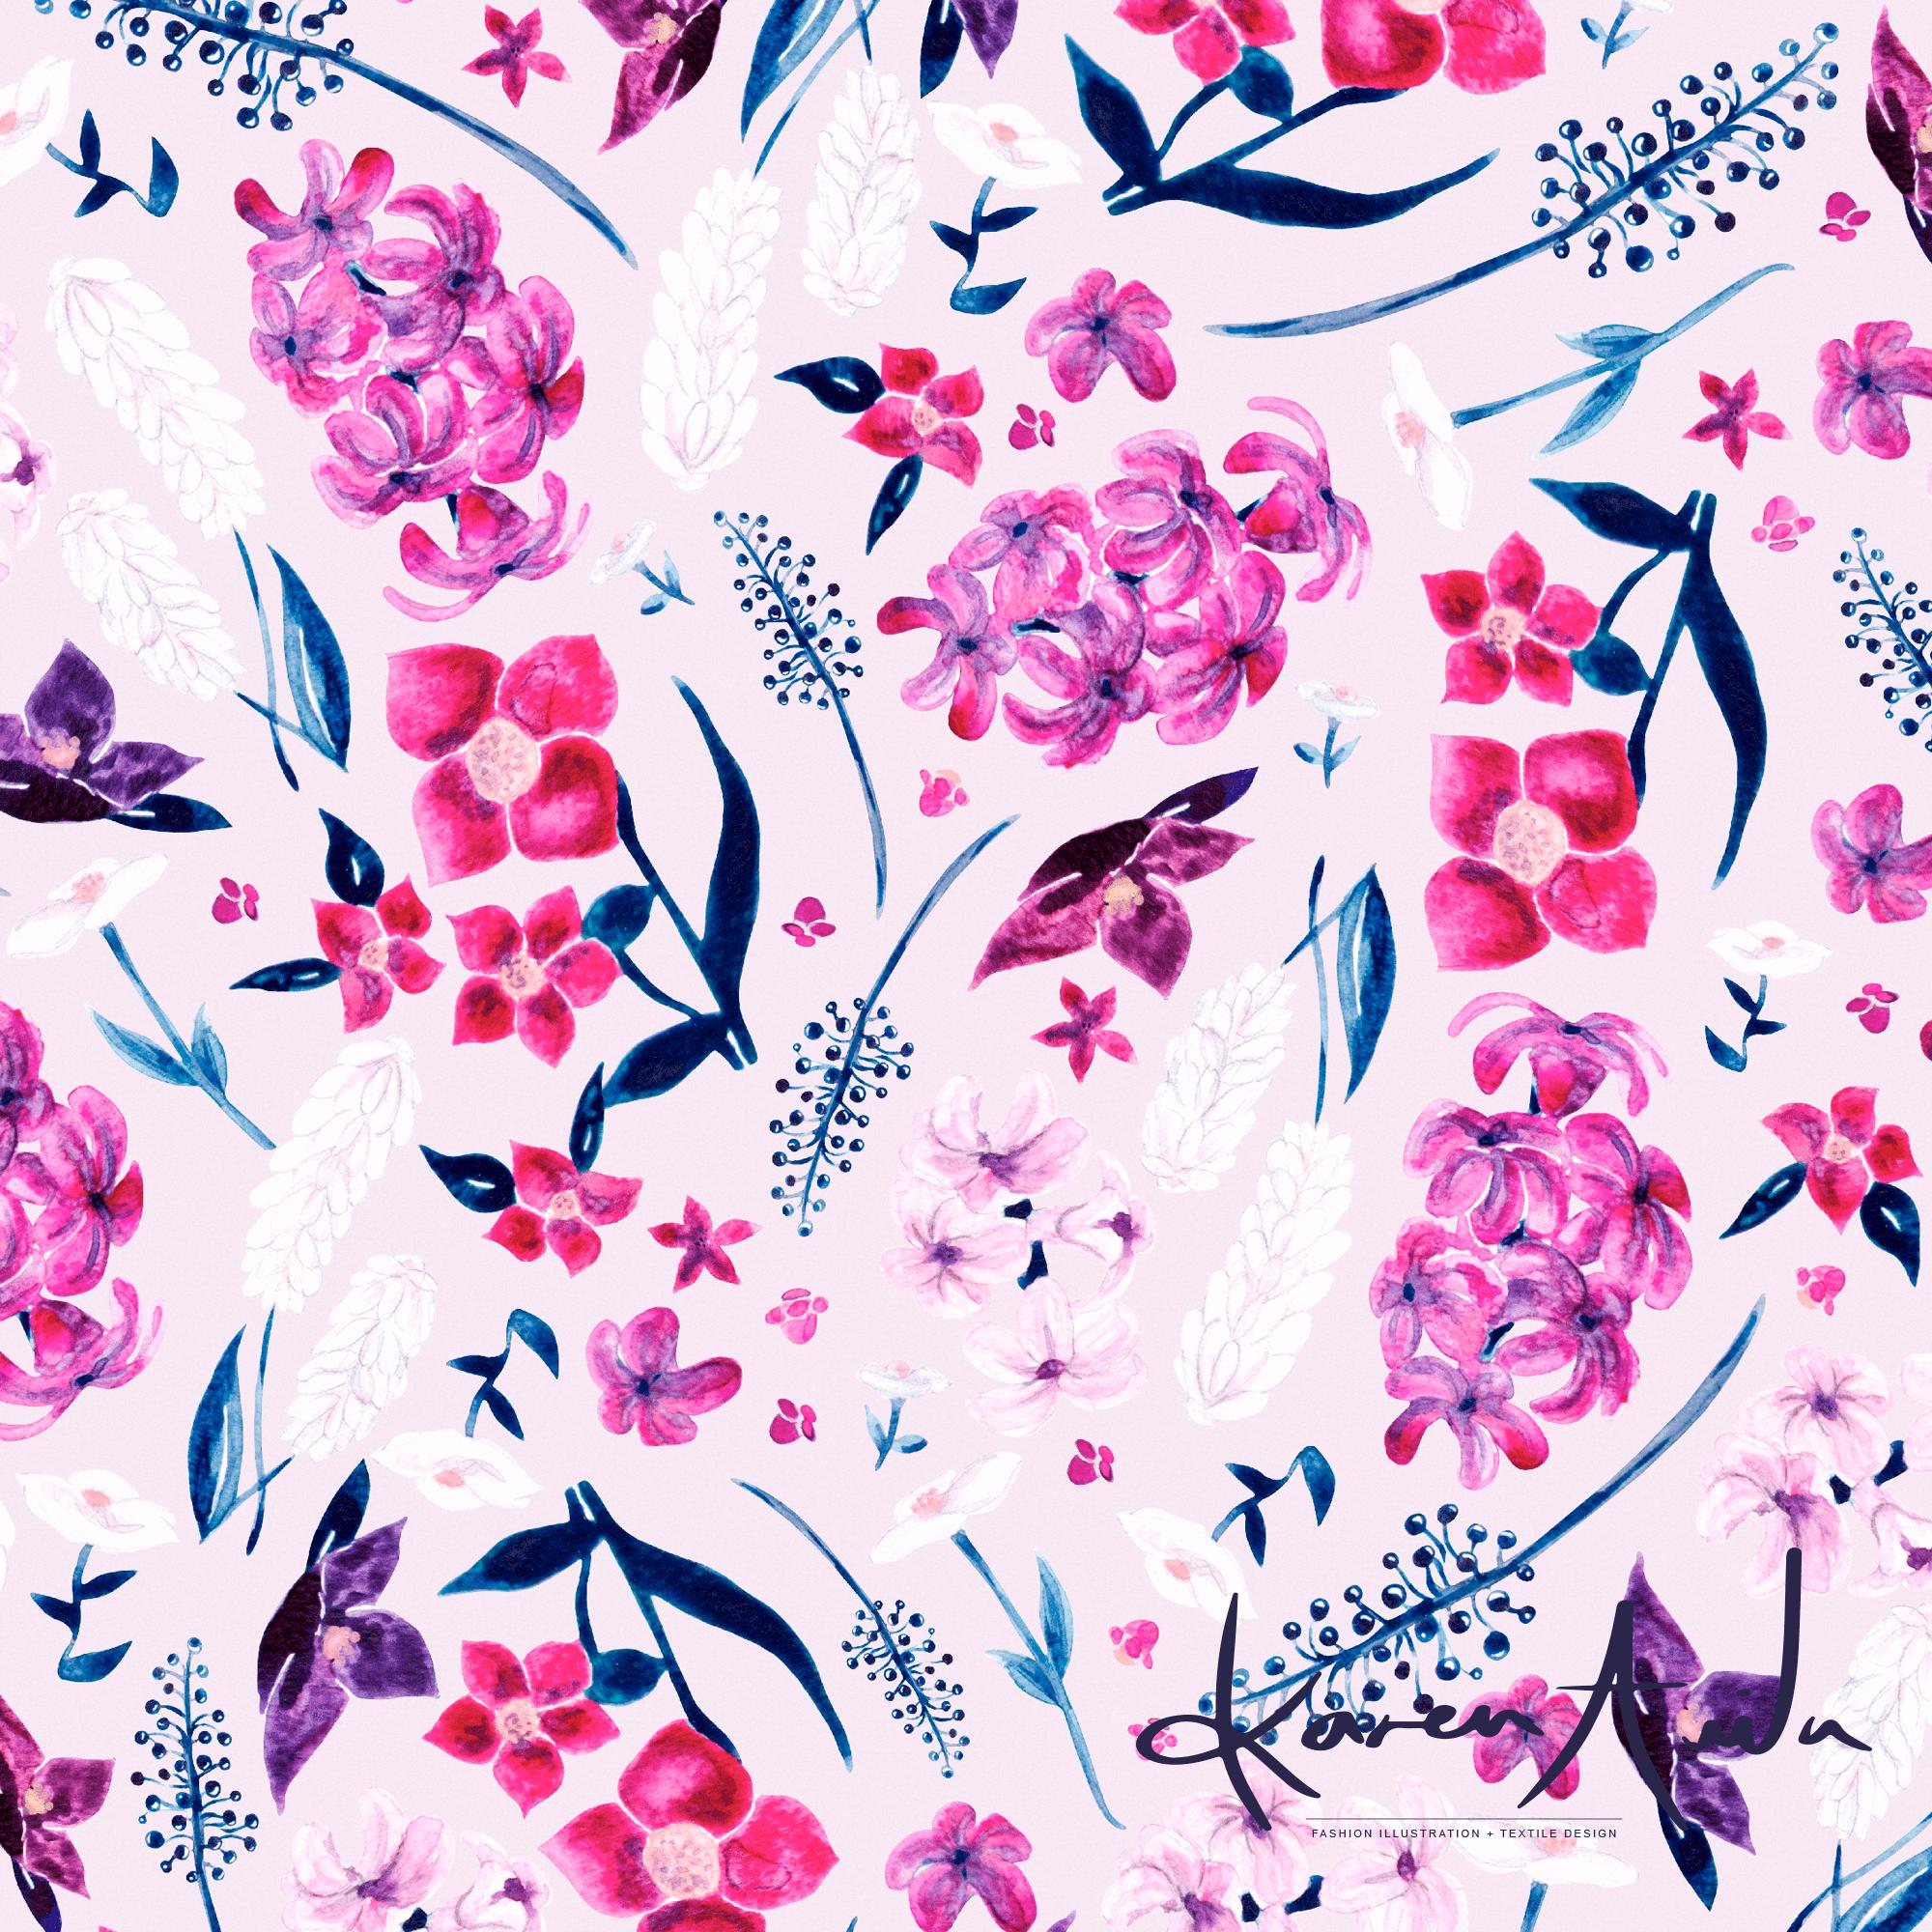 Surface+Pattern+Design+-+Textile+Pattern+Design+-+Repeat+Pattern+Design+-+Karen+Avila.png